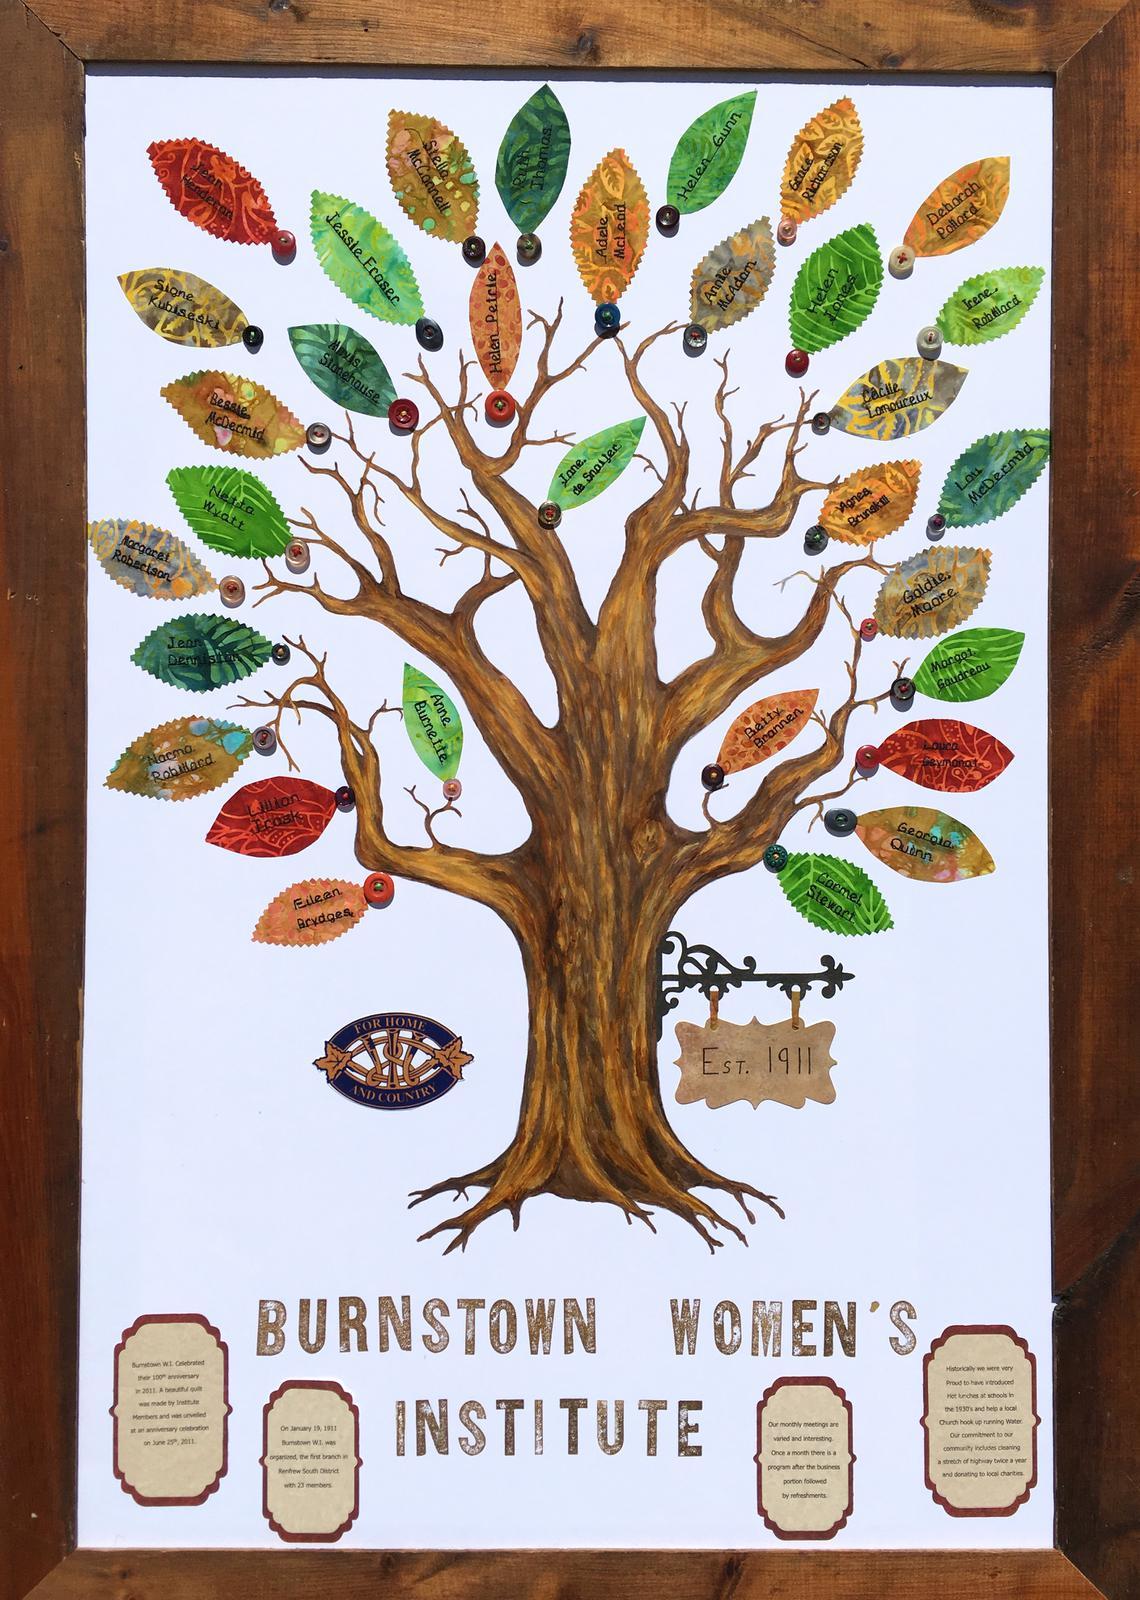 Canada 150 Art Tree Project - Burnstown W.I.